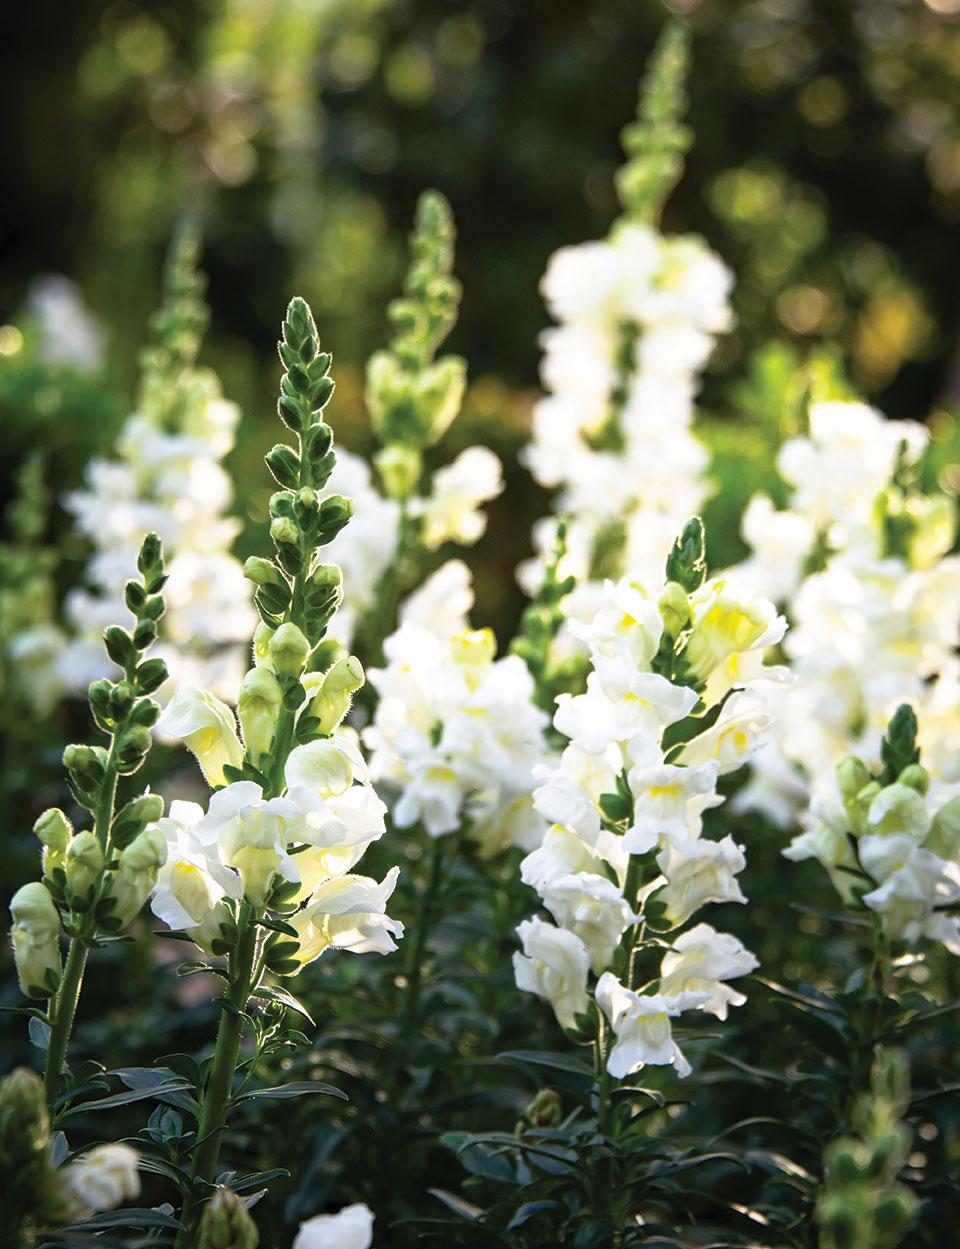 san diego formal garden snapdragons white flowers